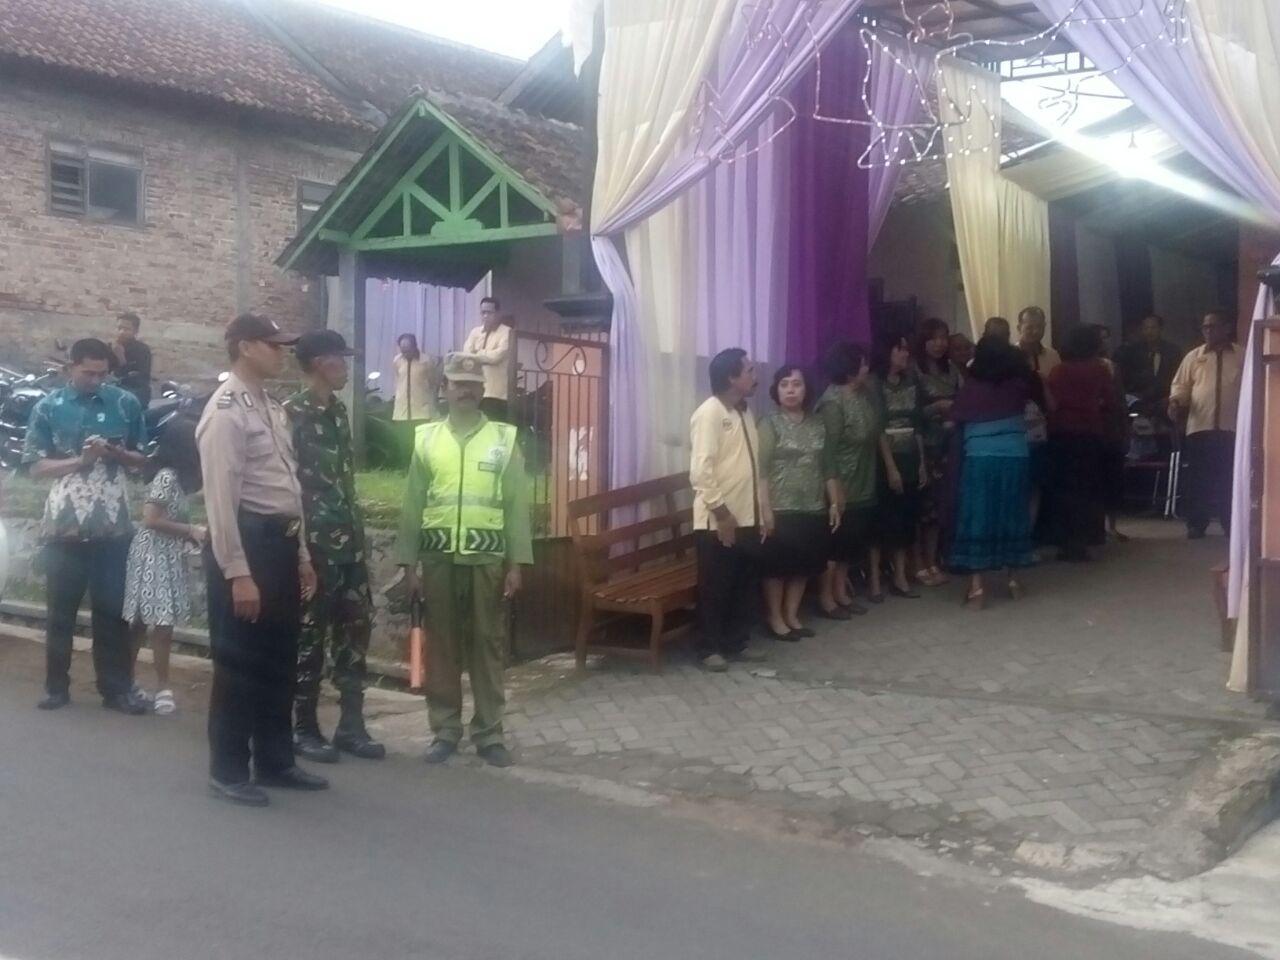 Polsek Junrejo Polres Batu Melaksanakan Giat Pengamanan Perayaan Tahun Baru 2018